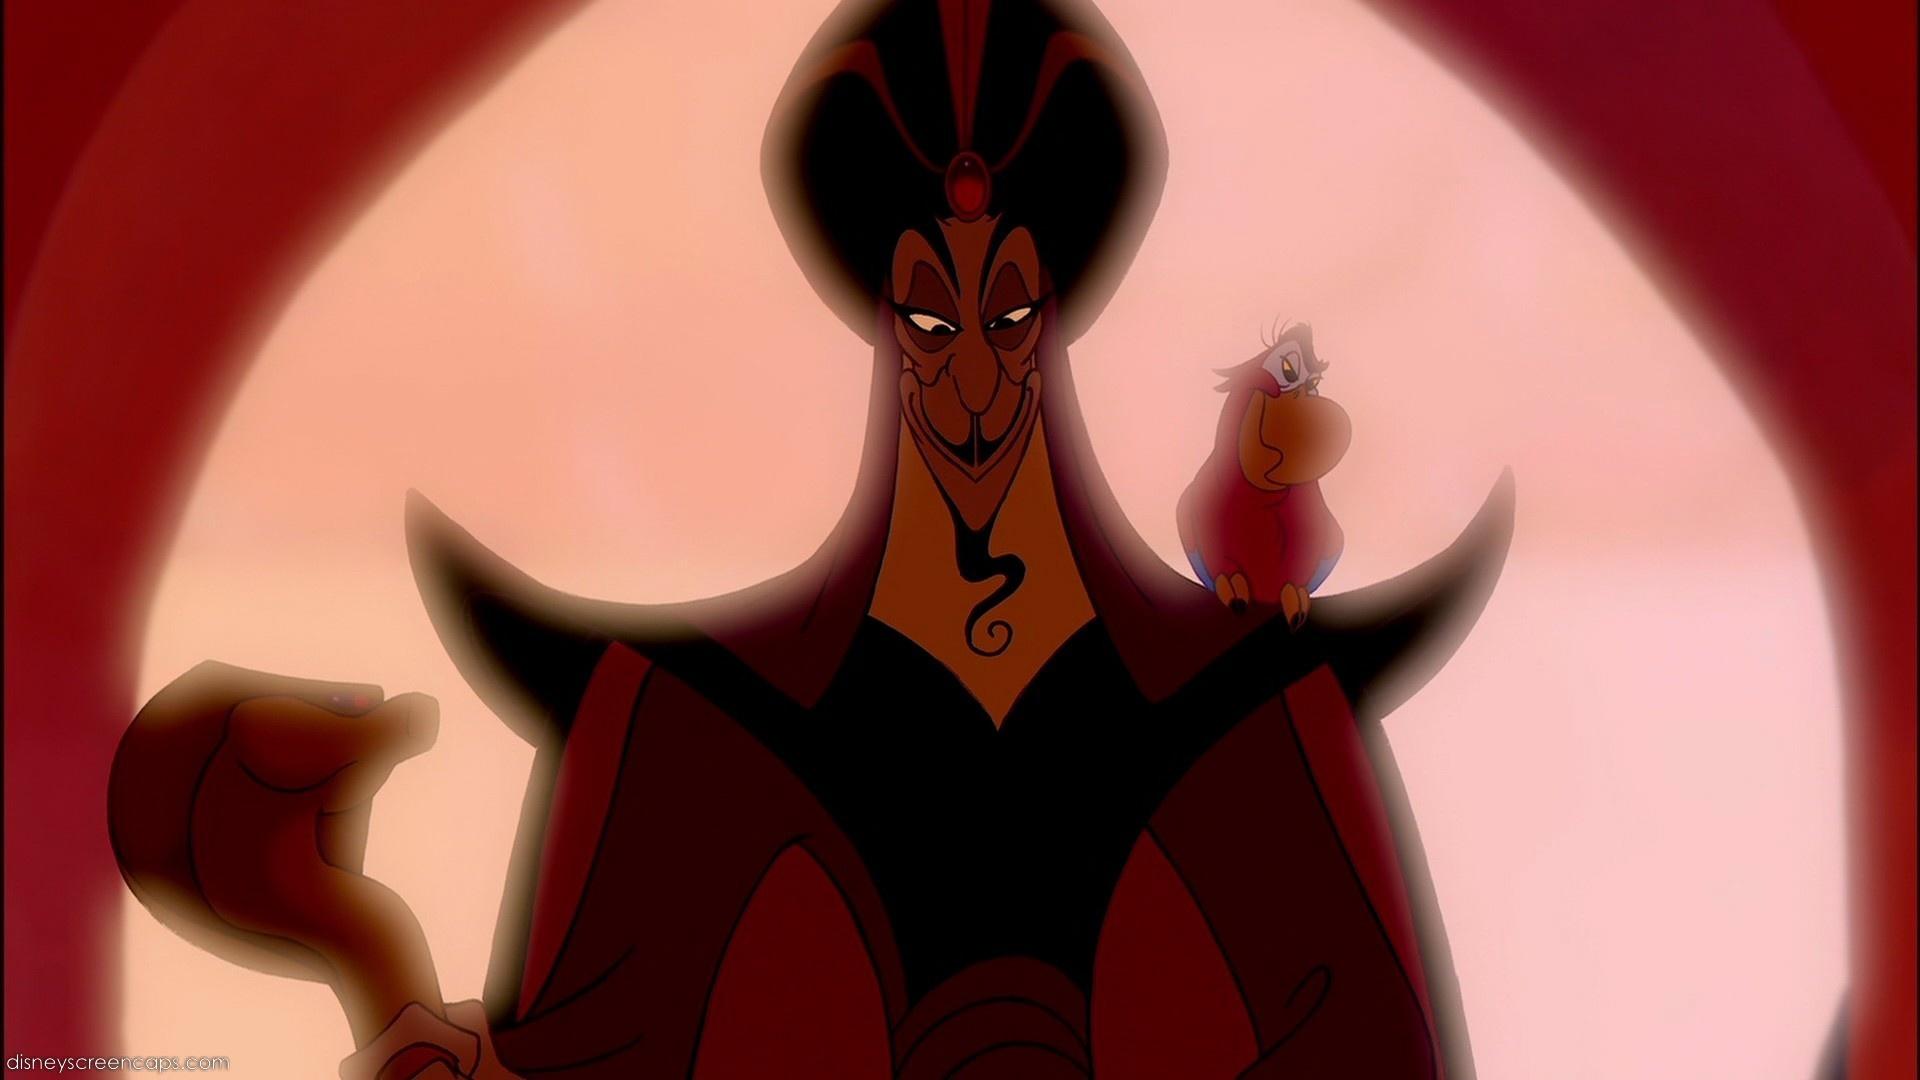 Who is your favorite Disney villain? - Quora